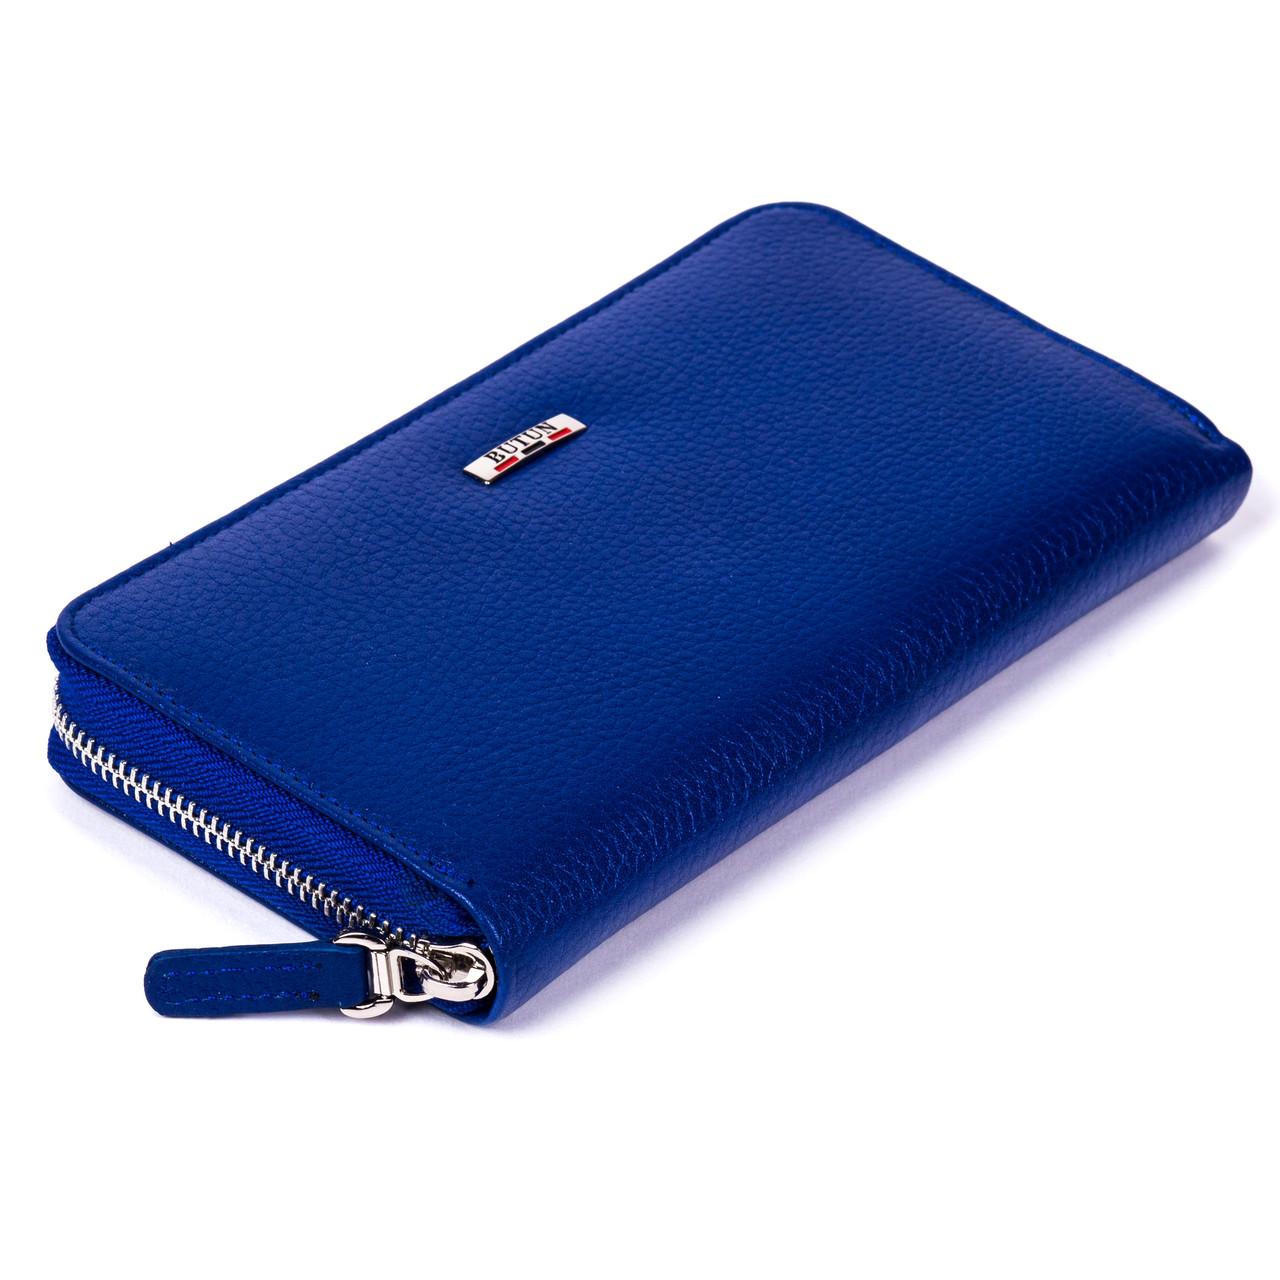 Женский кошелек Butun 639-004-013 кожаный синий